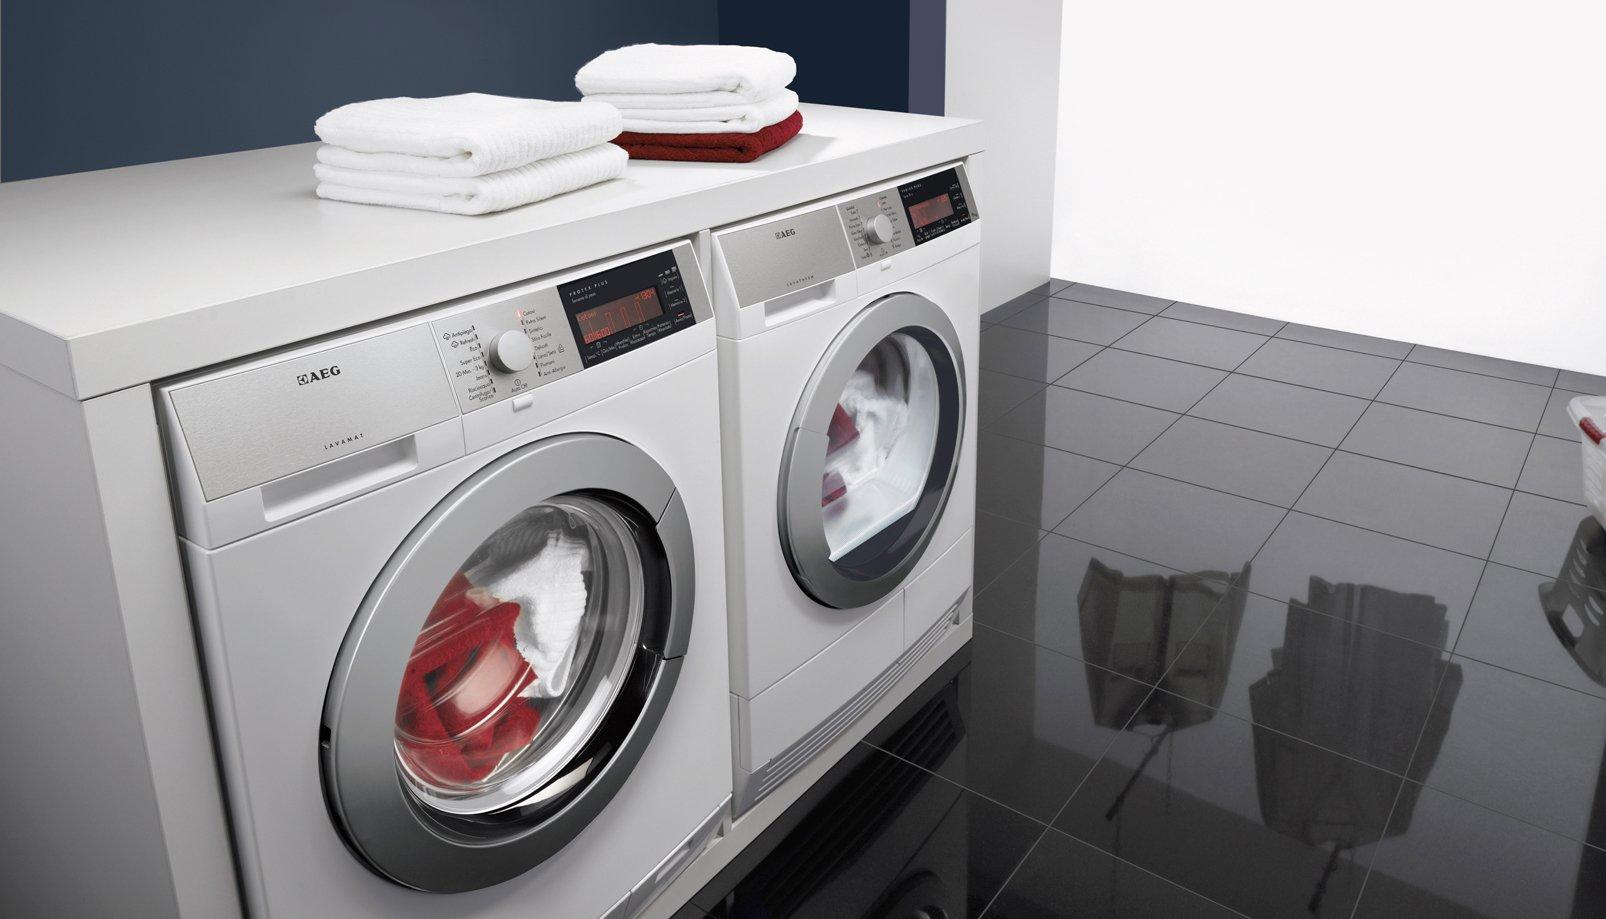 Asciugatrici consumi ridotti e programmi differenziati - Cucine a induzione consumi ...